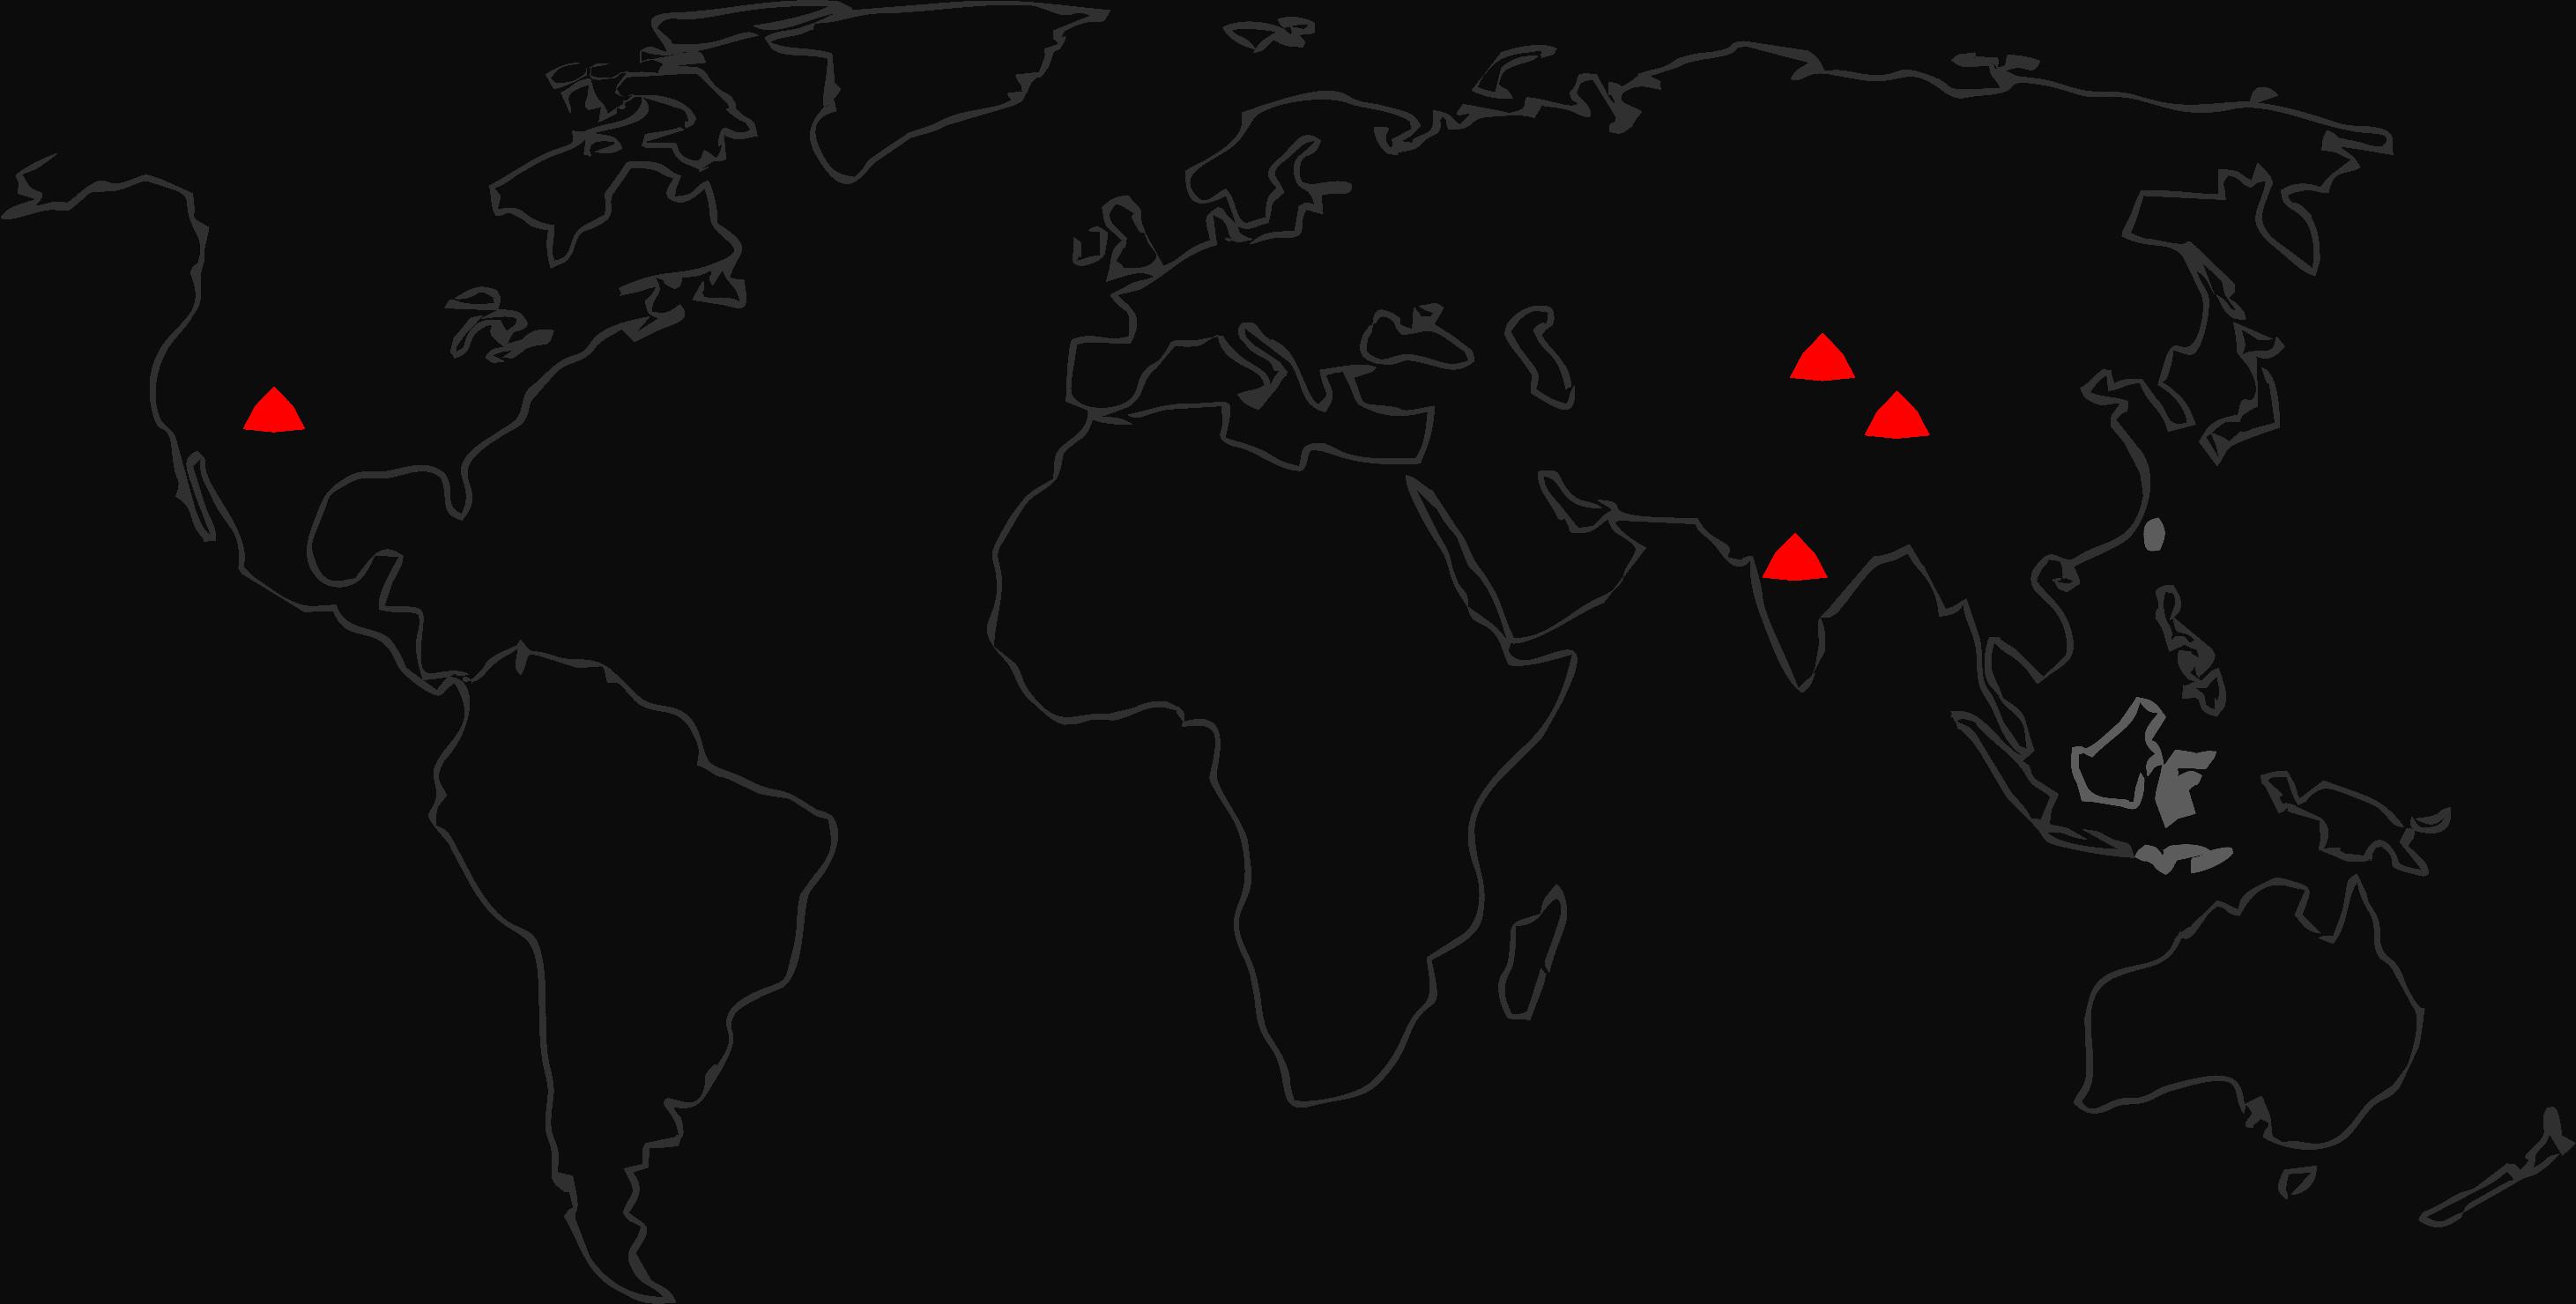 https://www.maheshwariandco.com/wp-content/uploads/2021/03/world-map.png